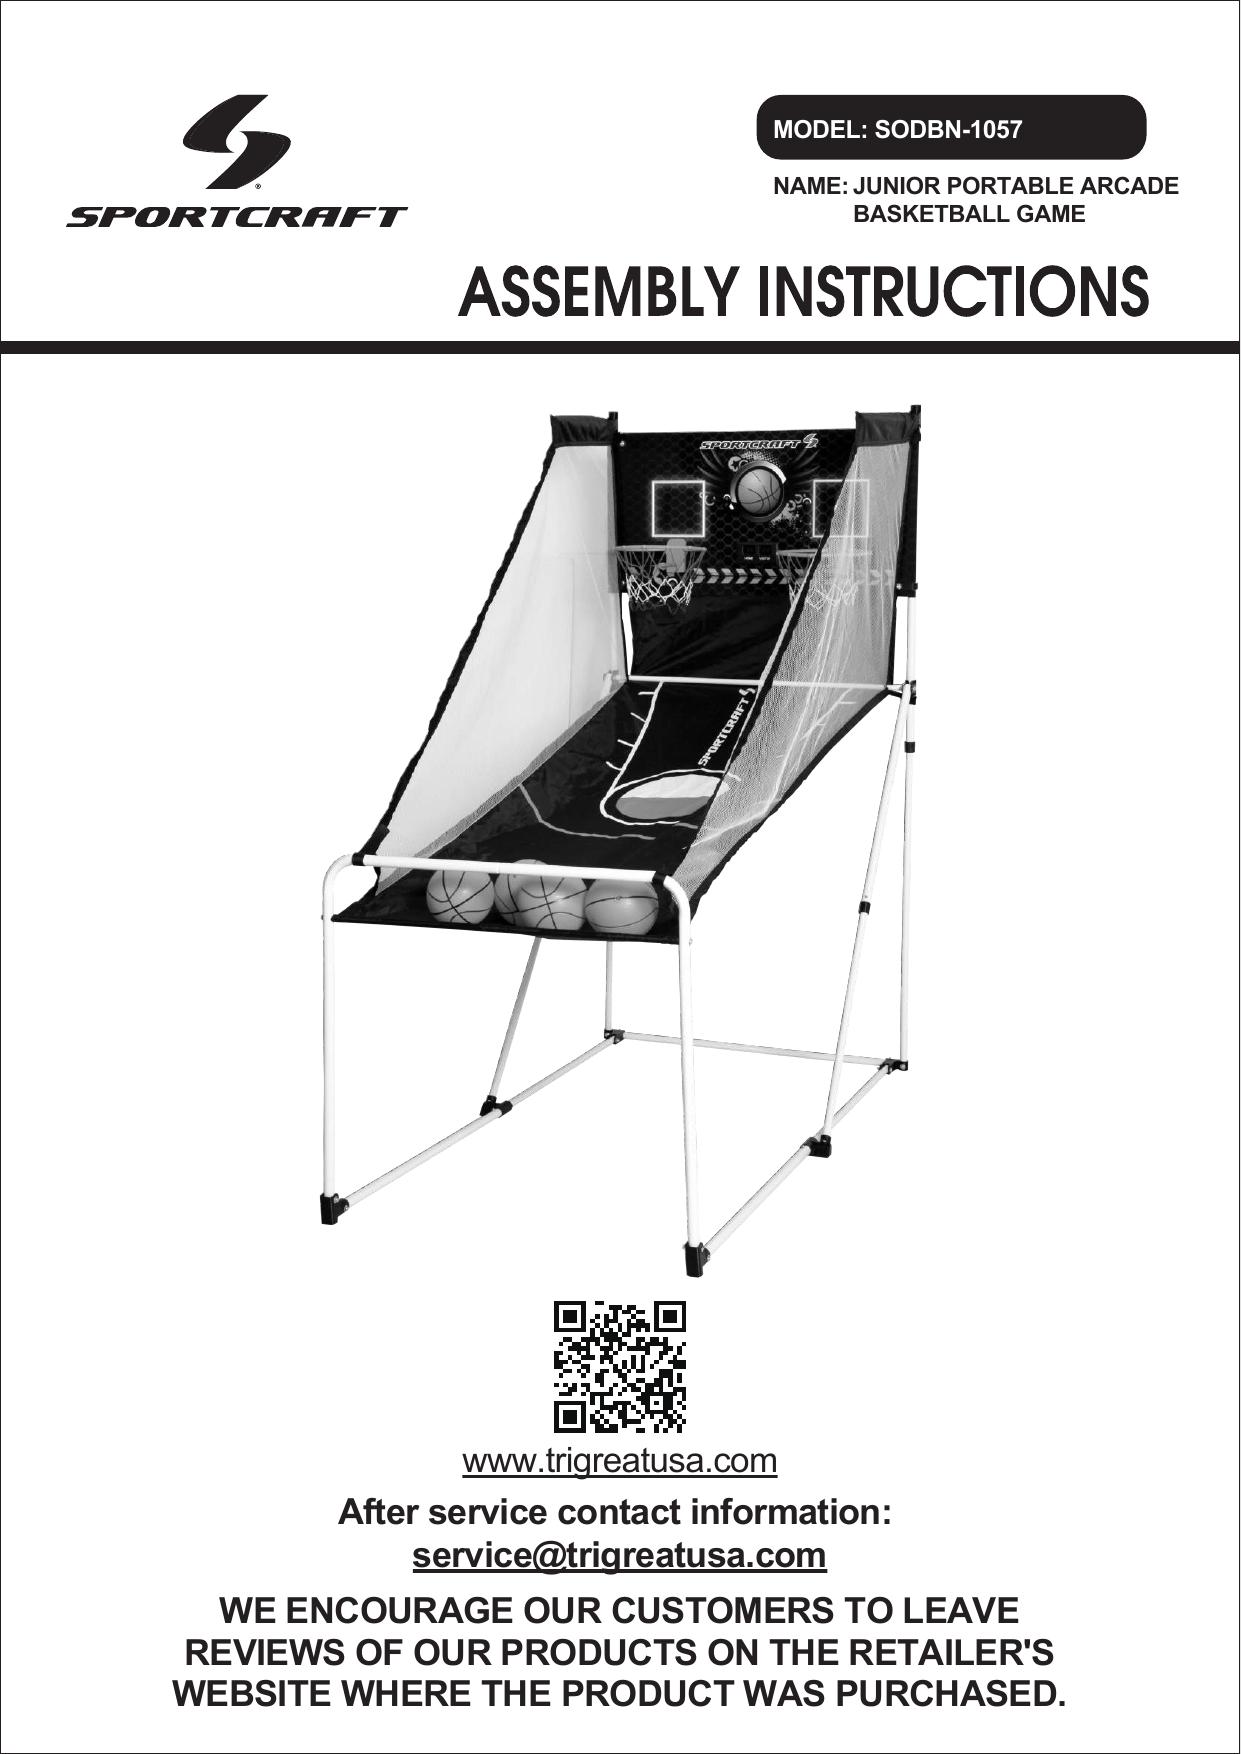 Sportcraft SODBN-1057 Junior Foldable Basketball Arcade Game for sale online